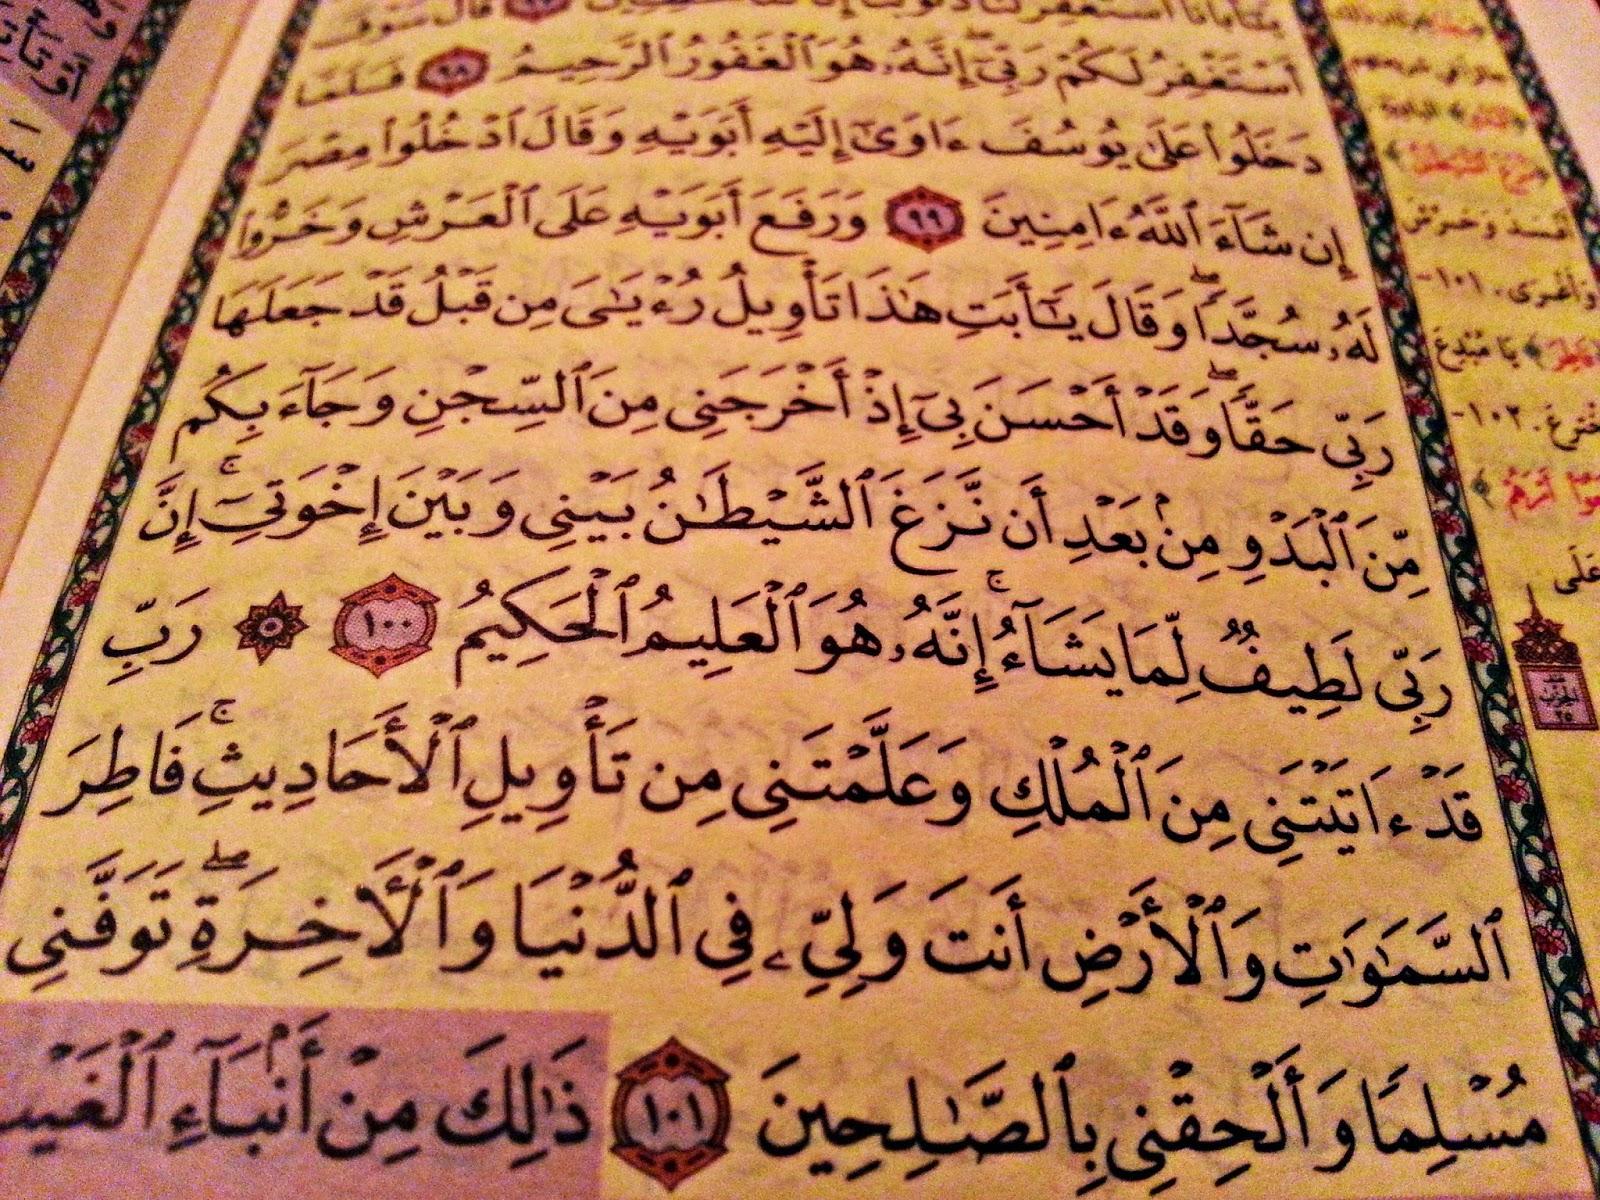 Baju Yusuf dalam al-Quran